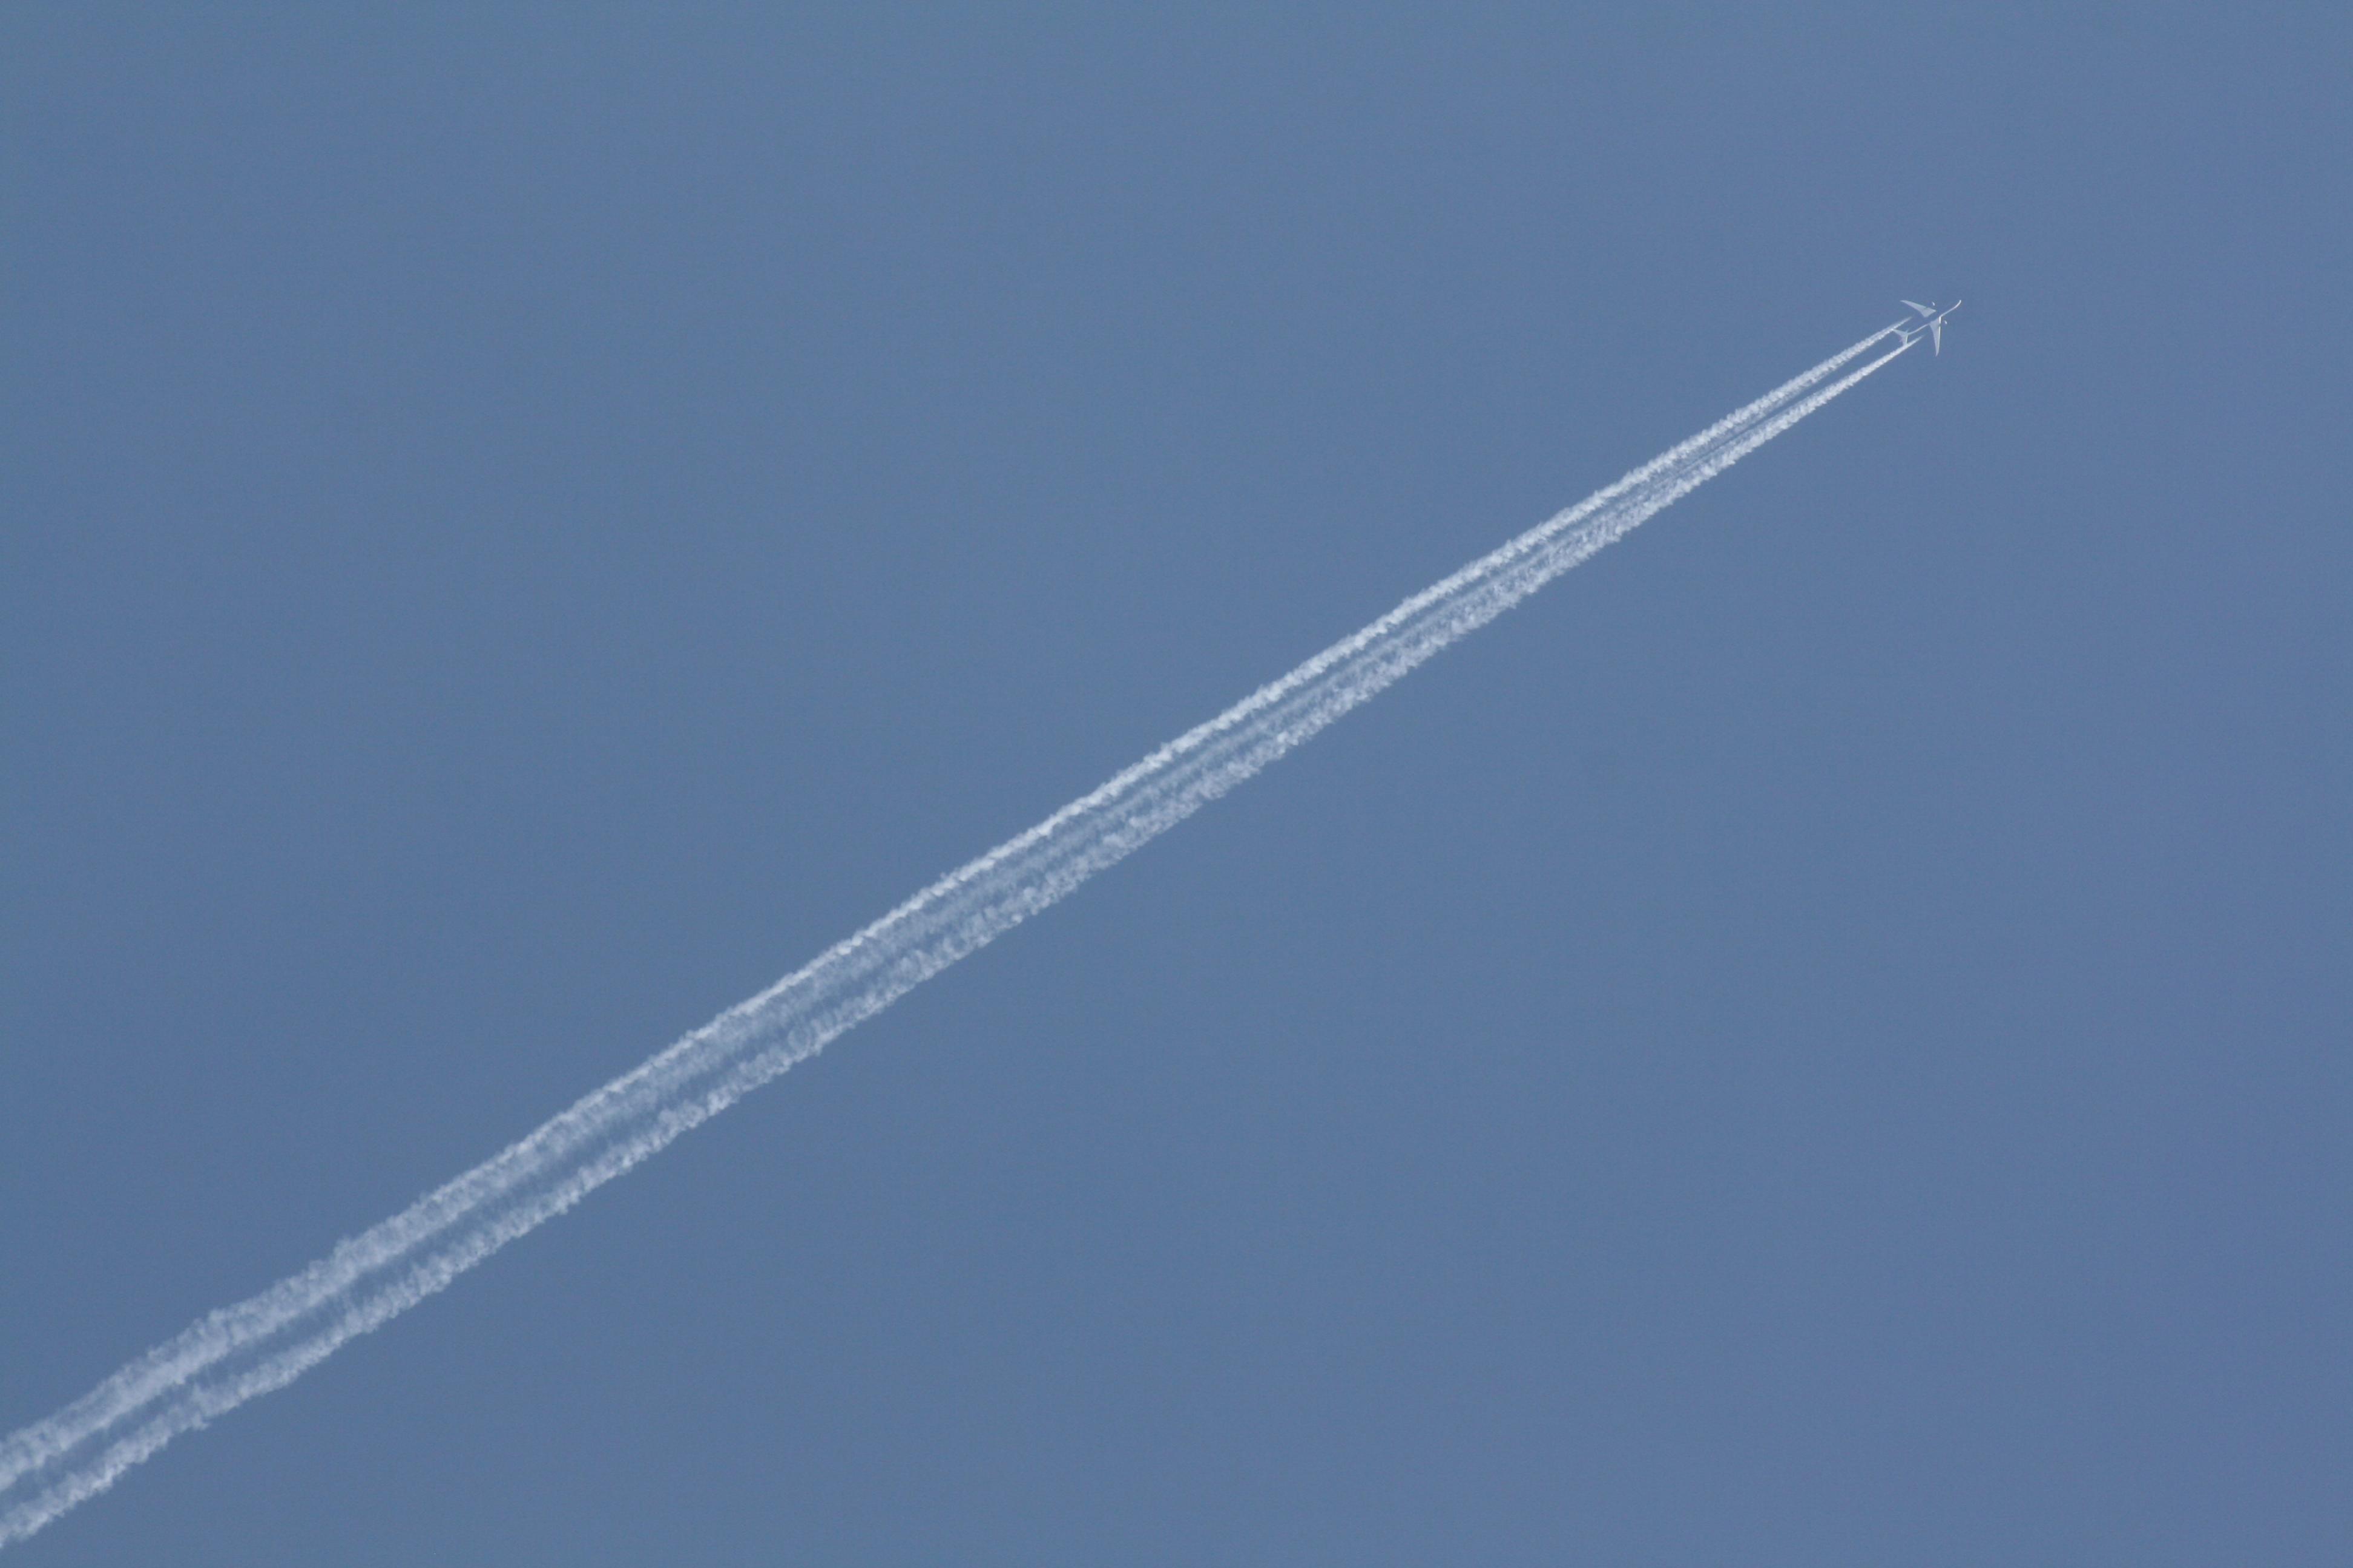 Naam: Boeing backgarden.jpg Bekeken: 536 Grootte: 391,7 KB